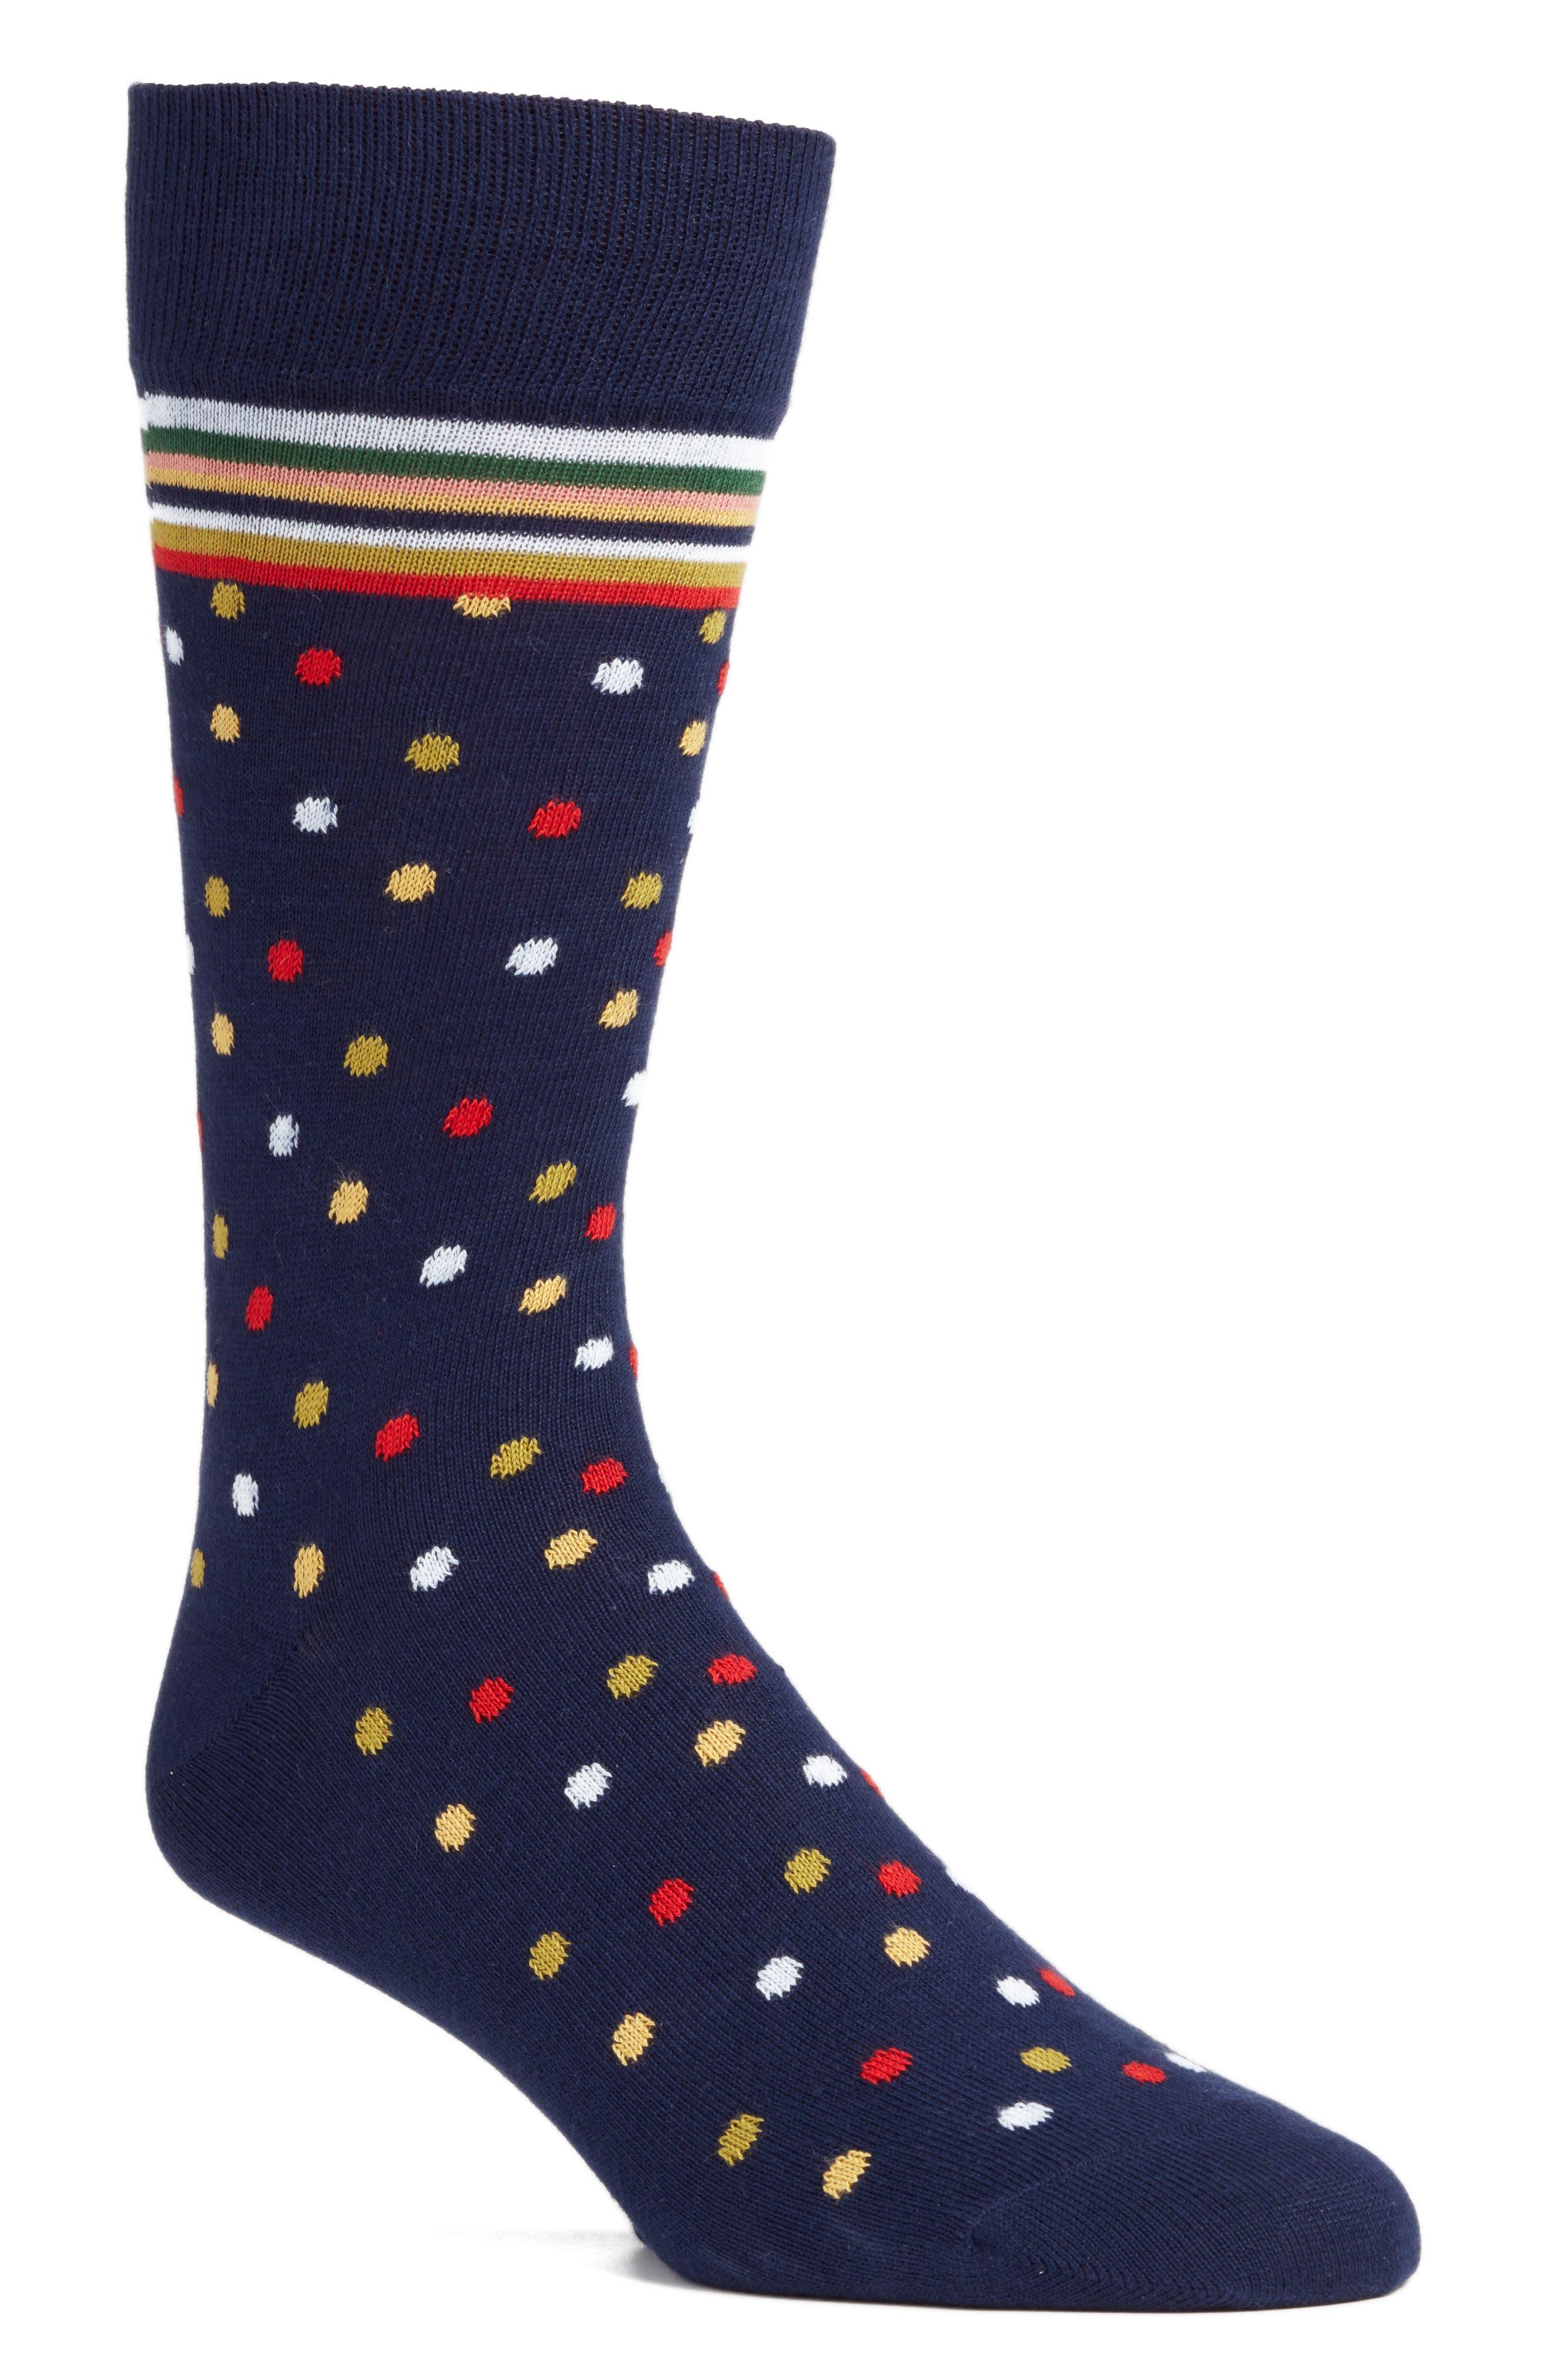 Main Image - Paul Smith Multi Mixer Dot Crew Socks